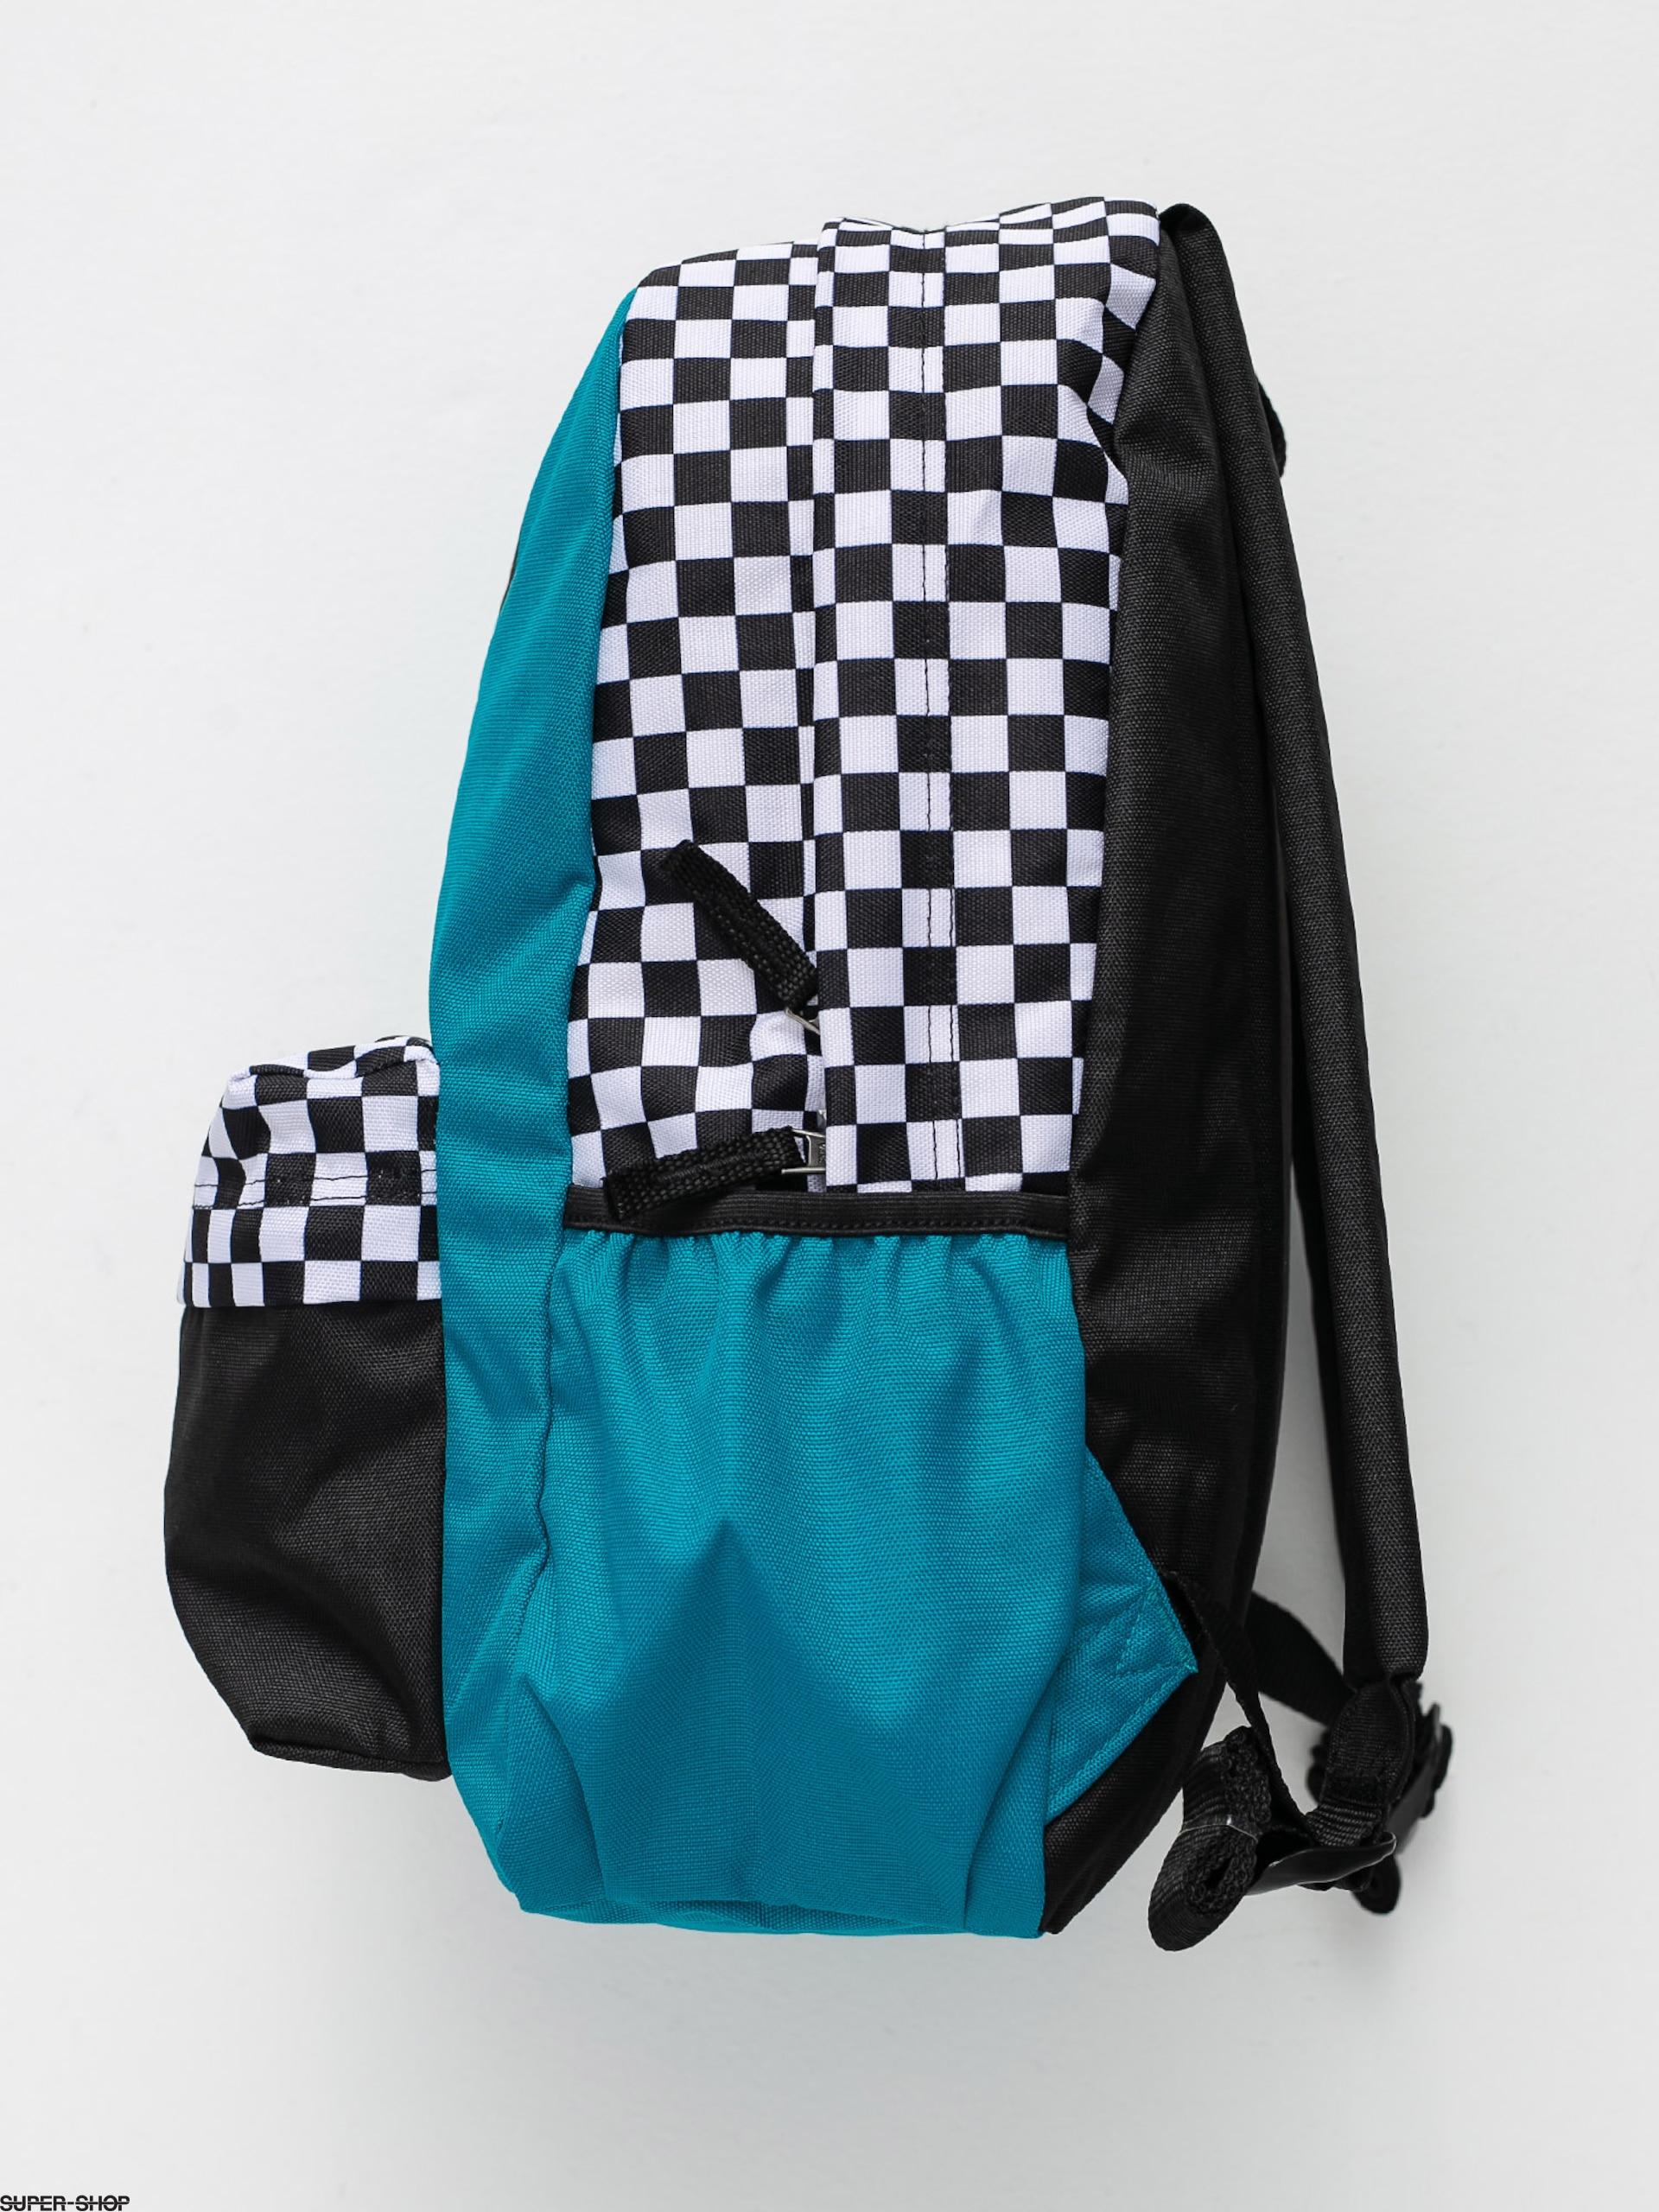 ecuación exagerar marca  Vans Street Sport Realm Backpack Wmn (enamel blue)